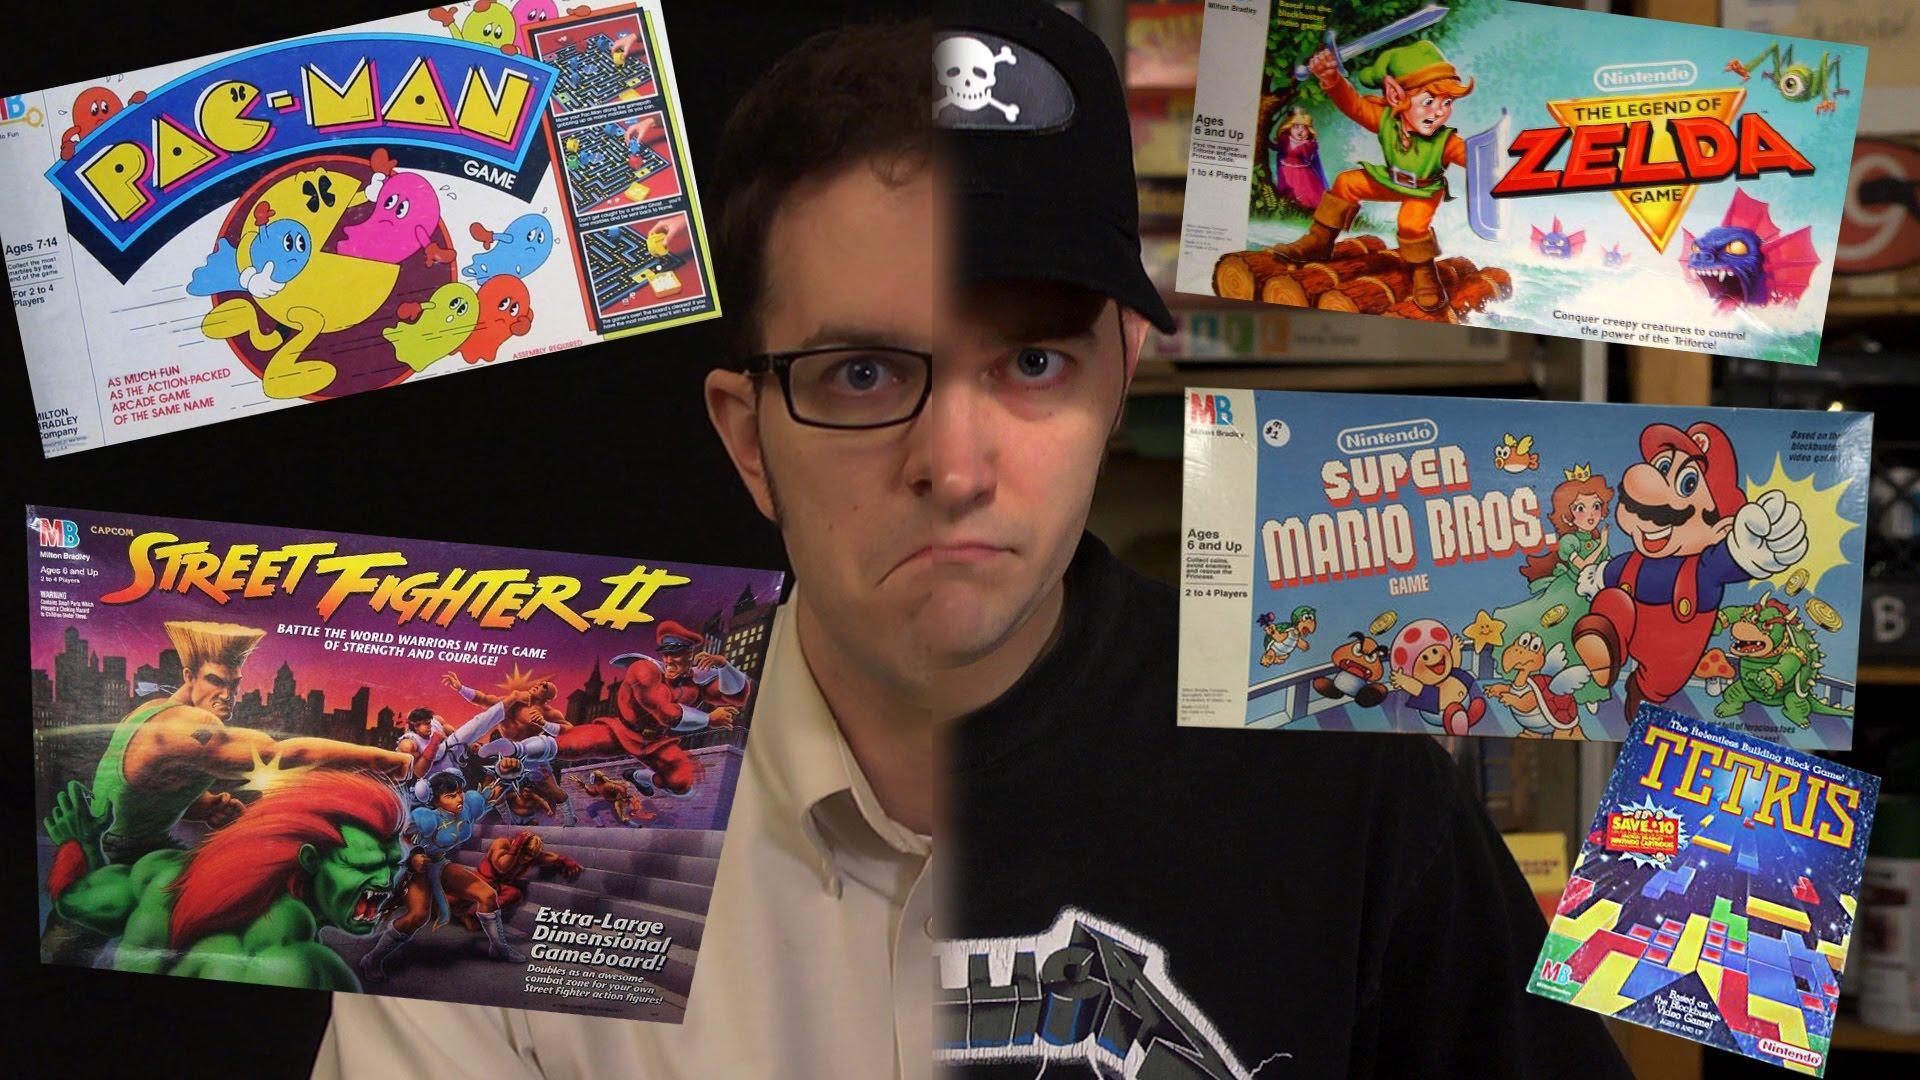 Board James Video Games Tv Episode 2015 Imdb